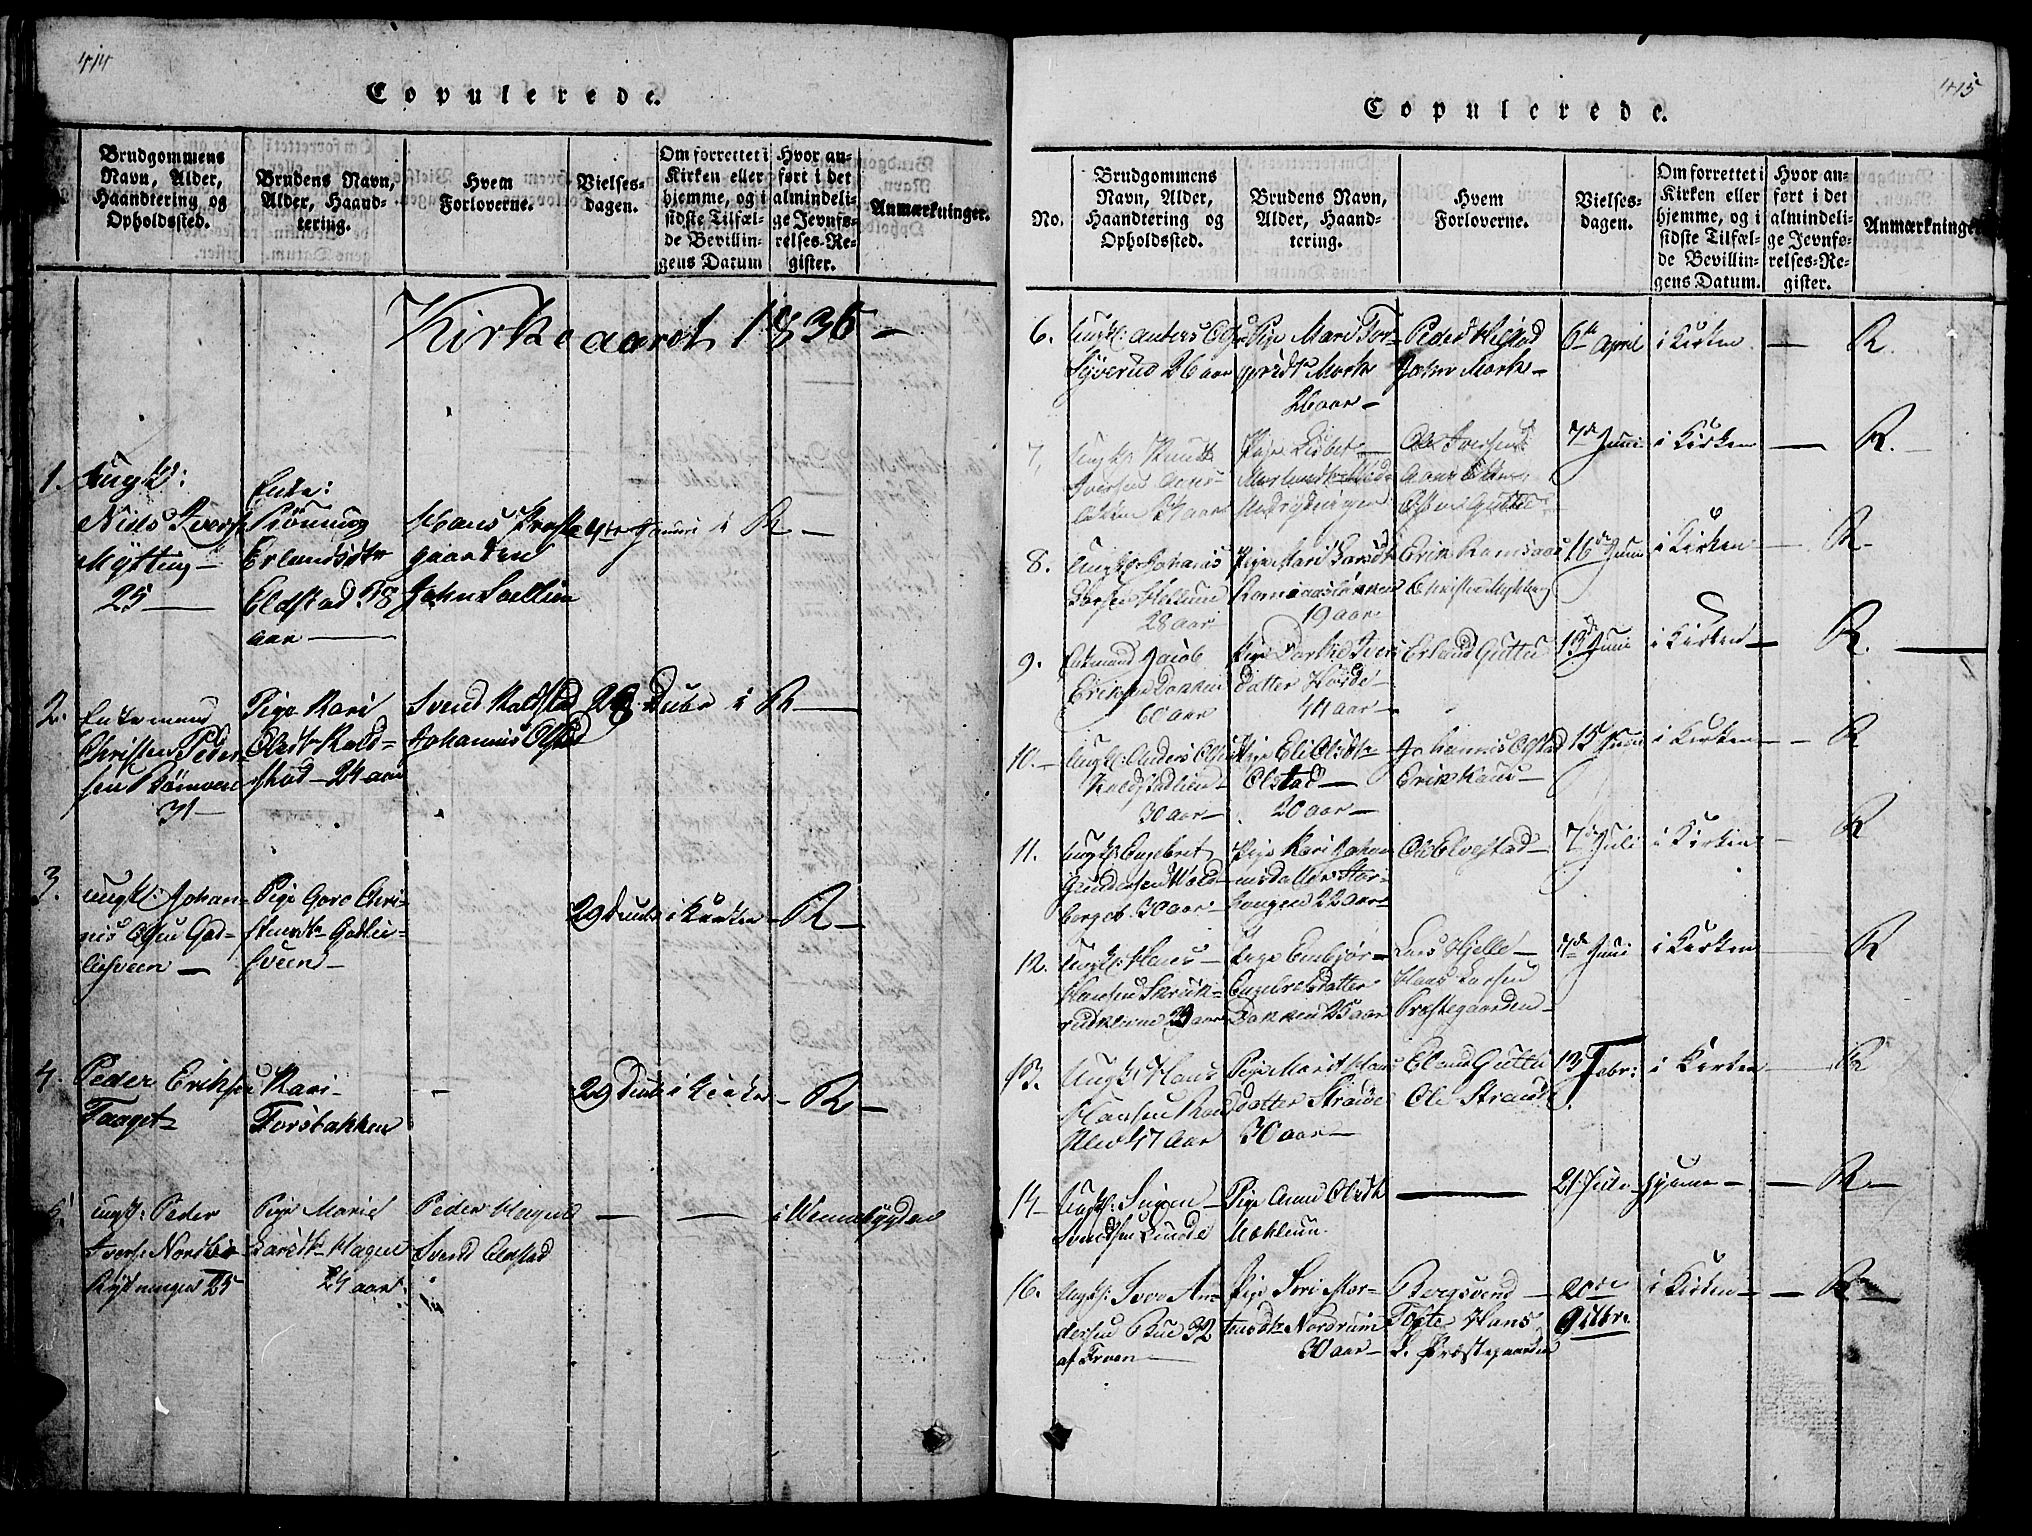 SAH, Ringebu prestekontor, Klokkerbok nr. 1, 1821-1839, s. 414-415